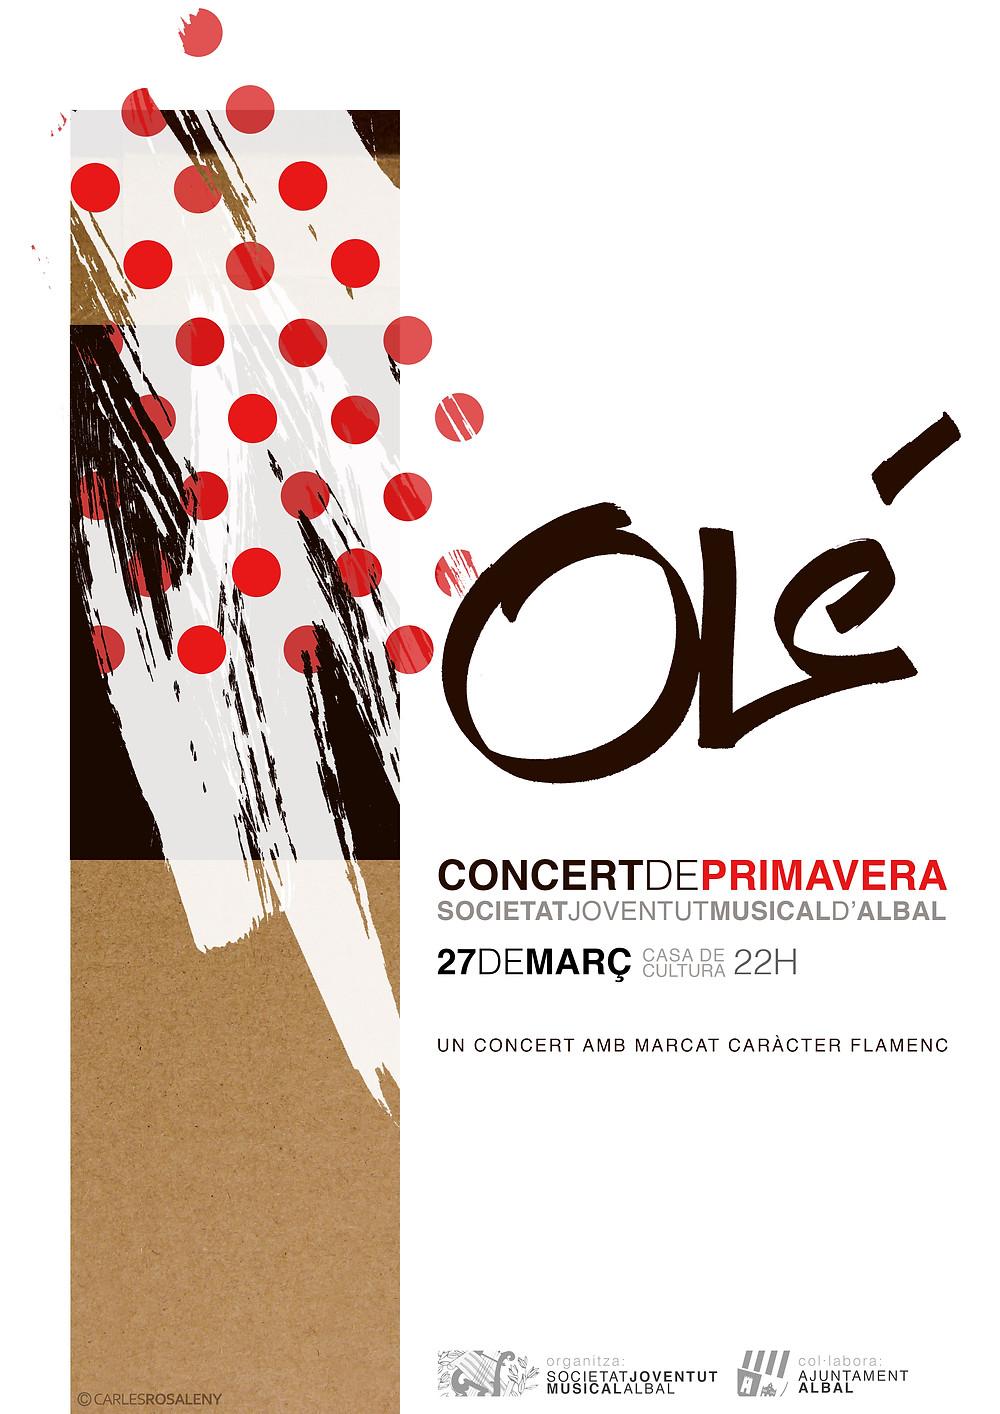 ConcertPrimavera.jpg